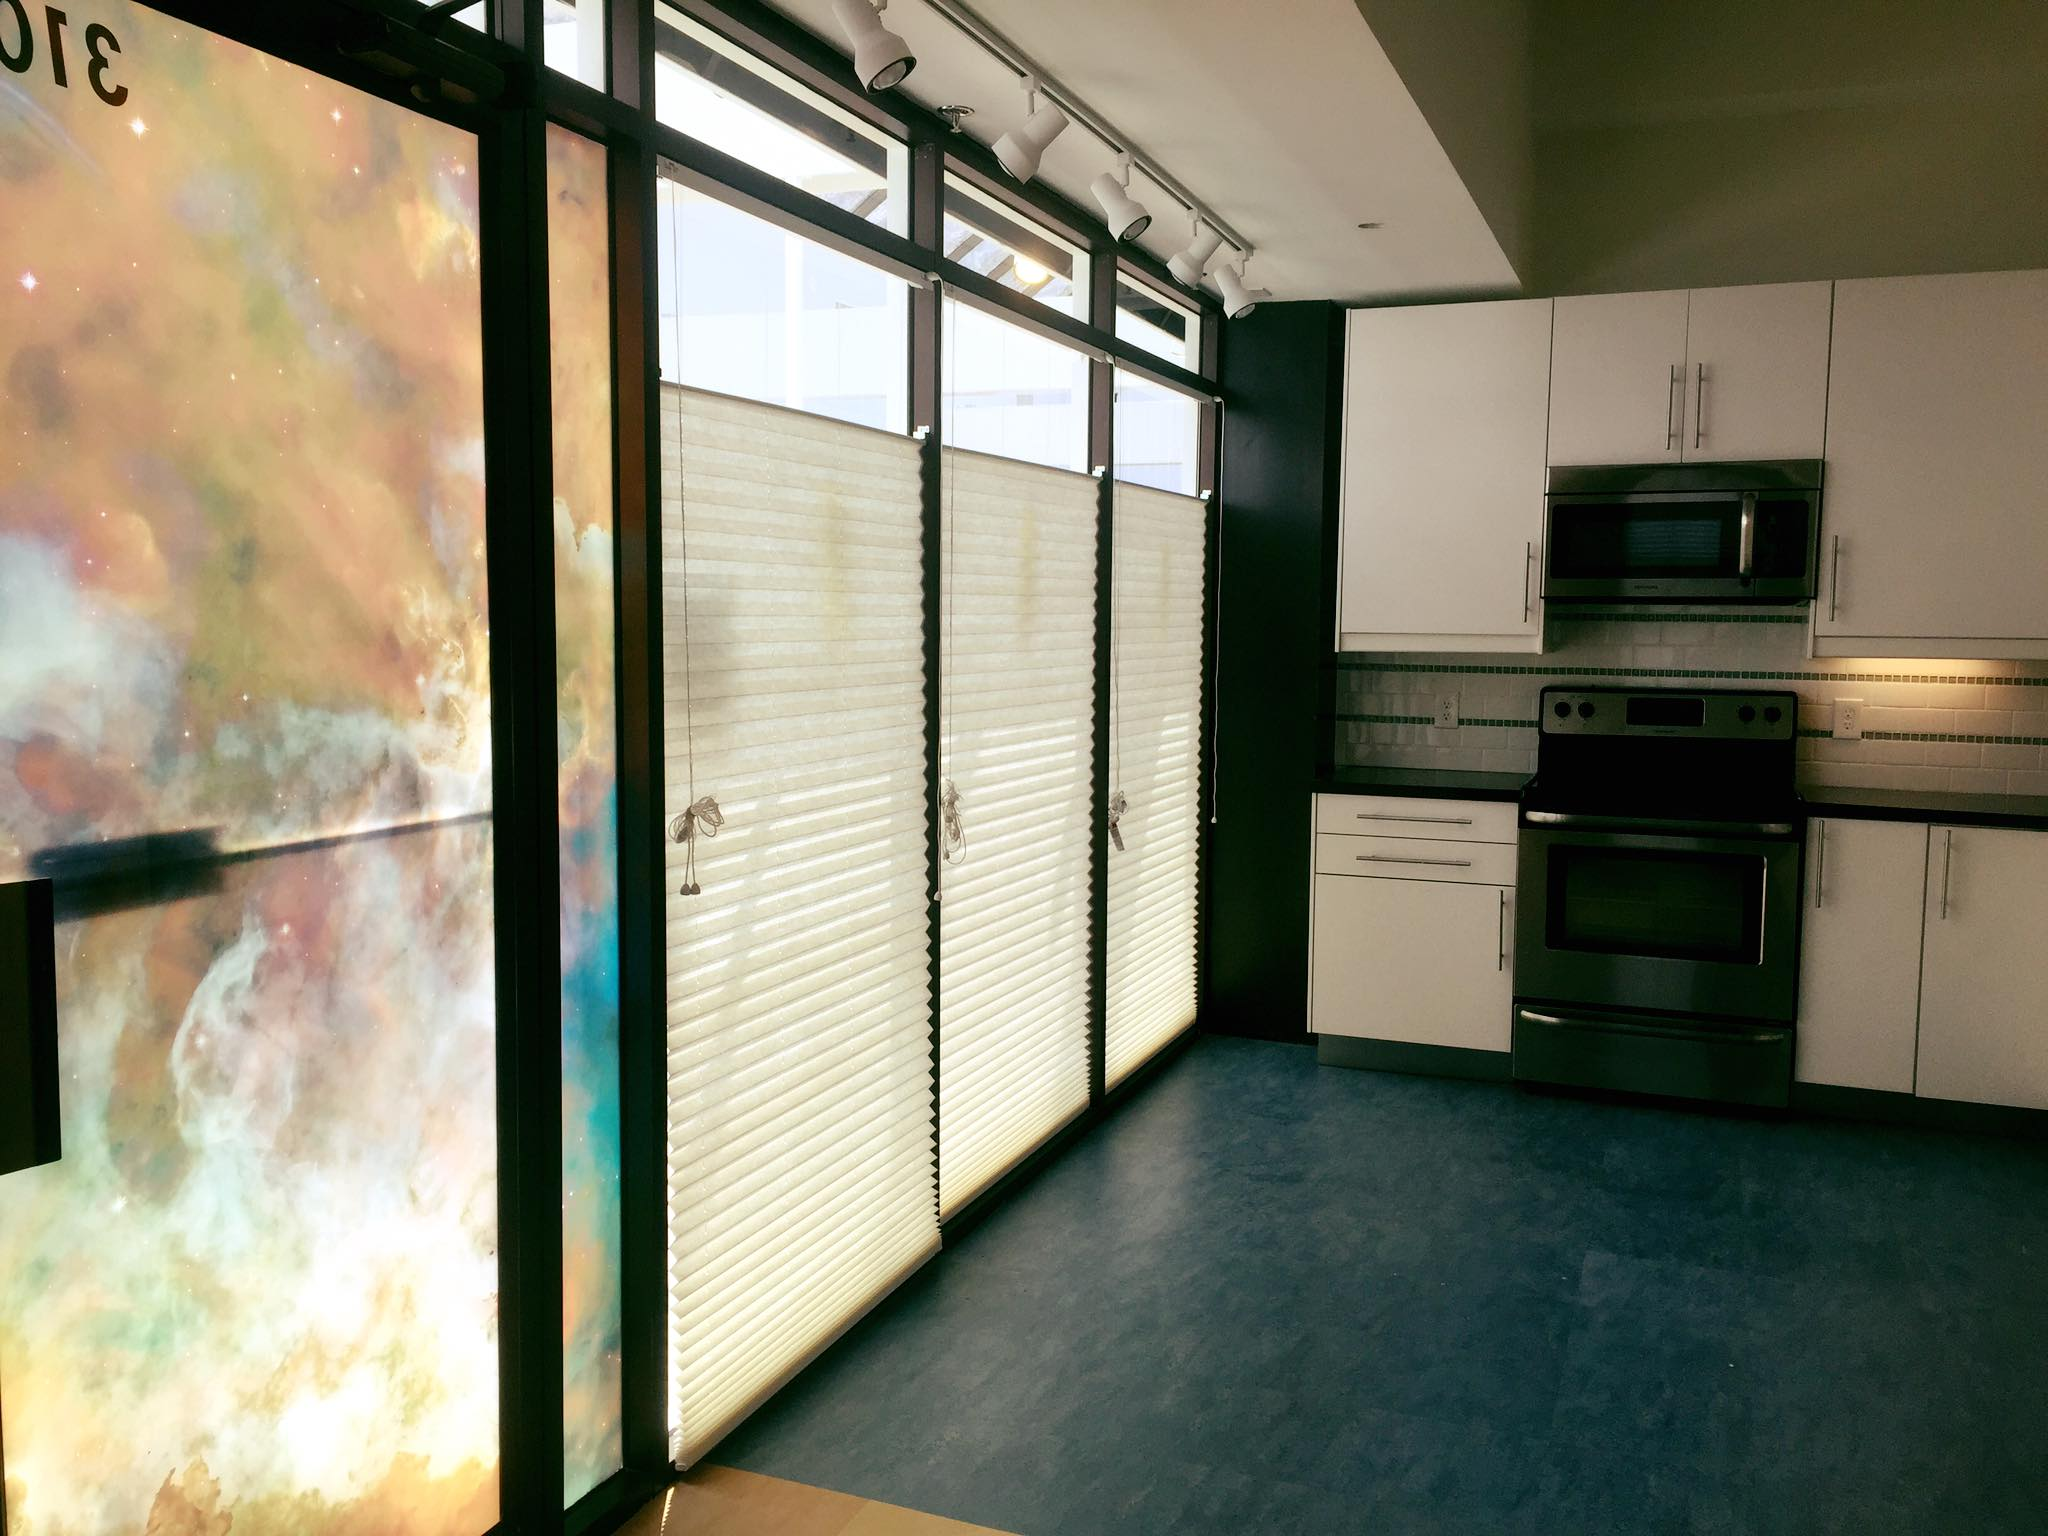 PrevAurora Apartments   Live Work   Art Studios   Downtown Roanoke  VA. Apartments In Downtown Roanoke Va. Home Design Ideas